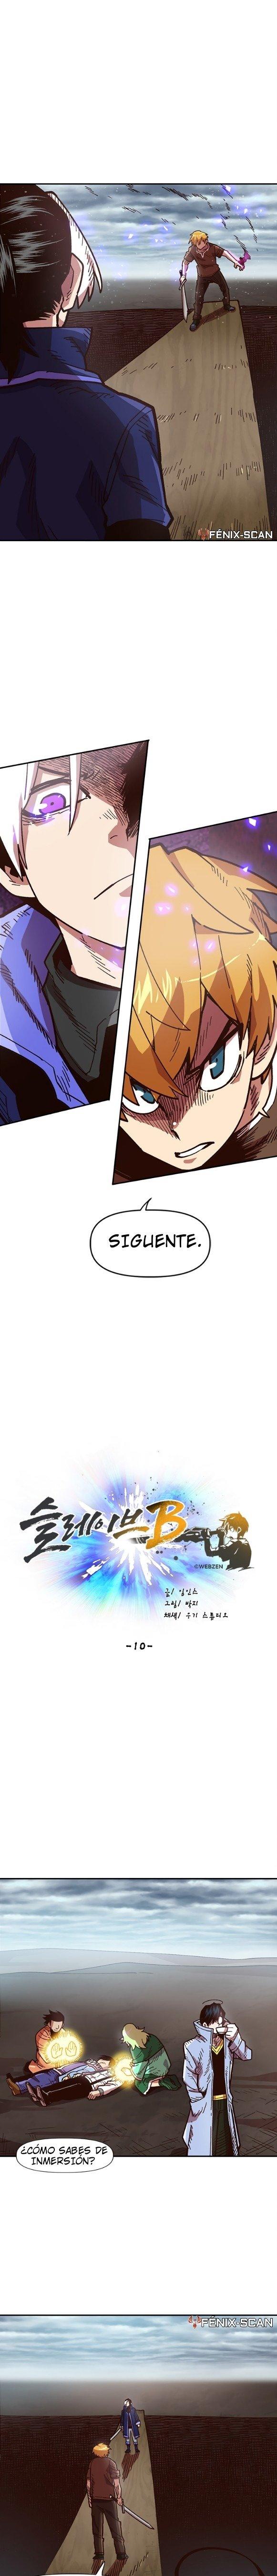 https://nine.mangadogs.com/es_manga/pic8/15/35919/948230/559269b636448e707b934d2e19a15af8.jpg Page 8